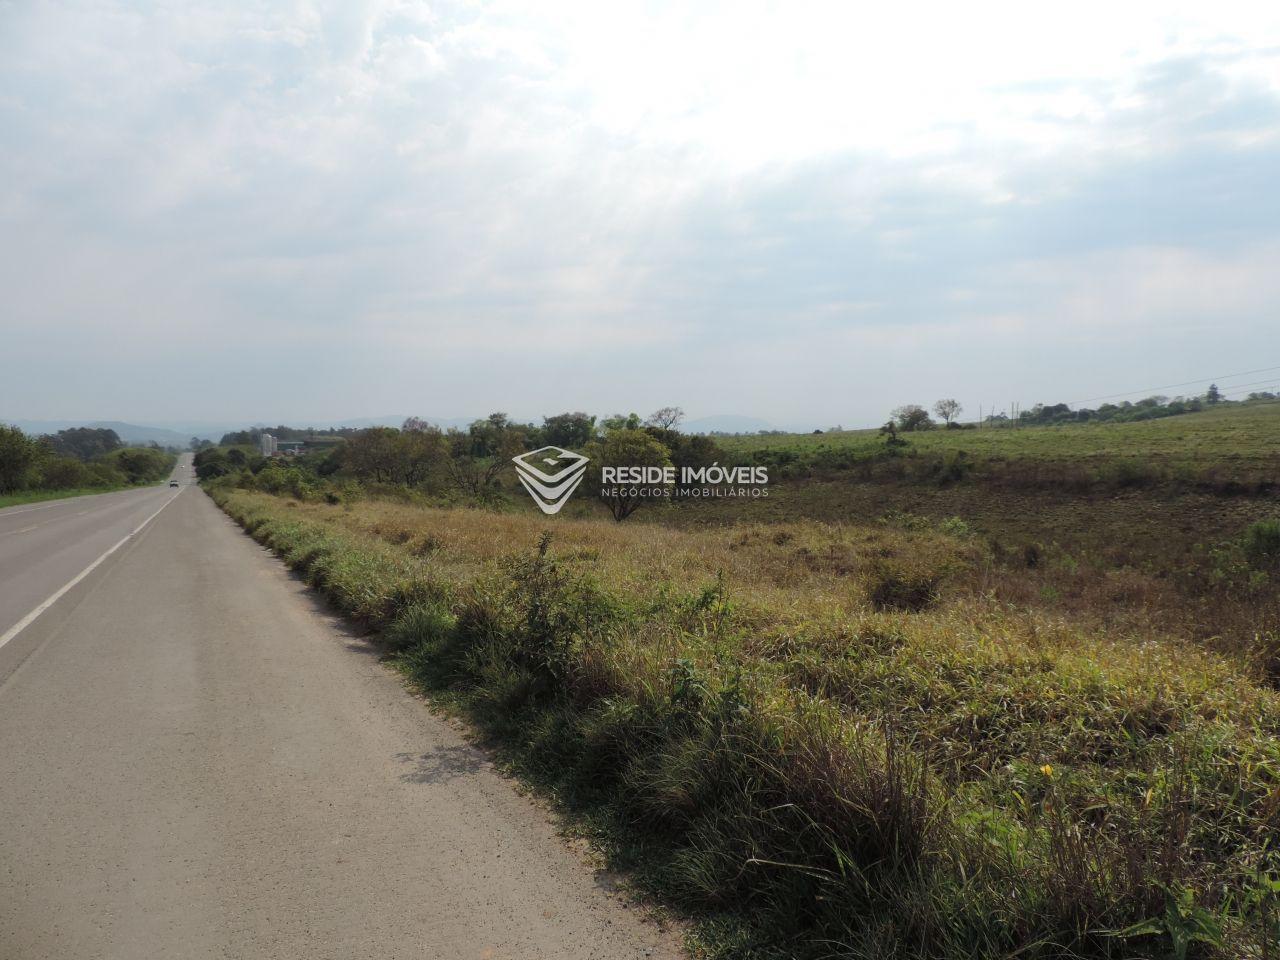 Terreno/Lote à venda  no Zona Rural - Santa Maria, RS. Imóveis